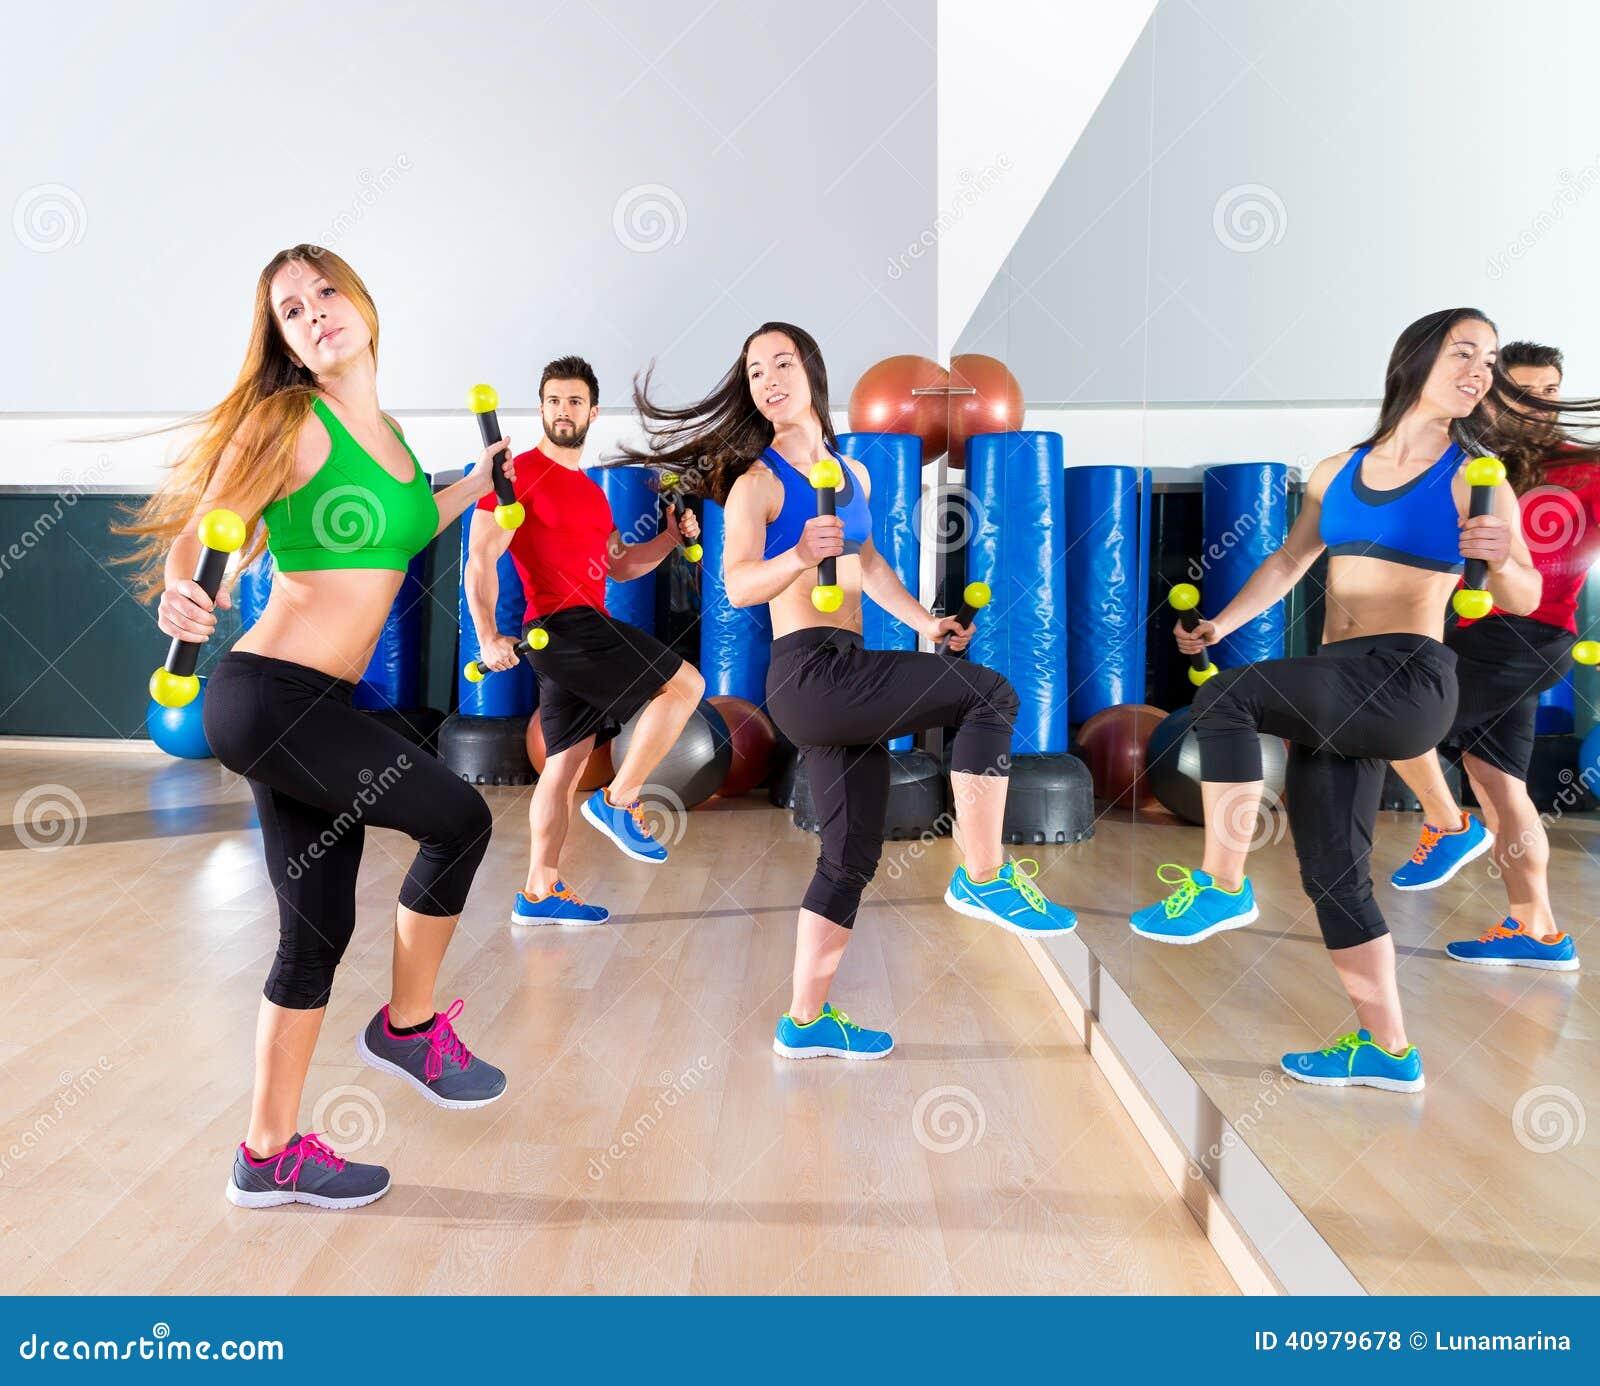 You tell. zumba dance fitness